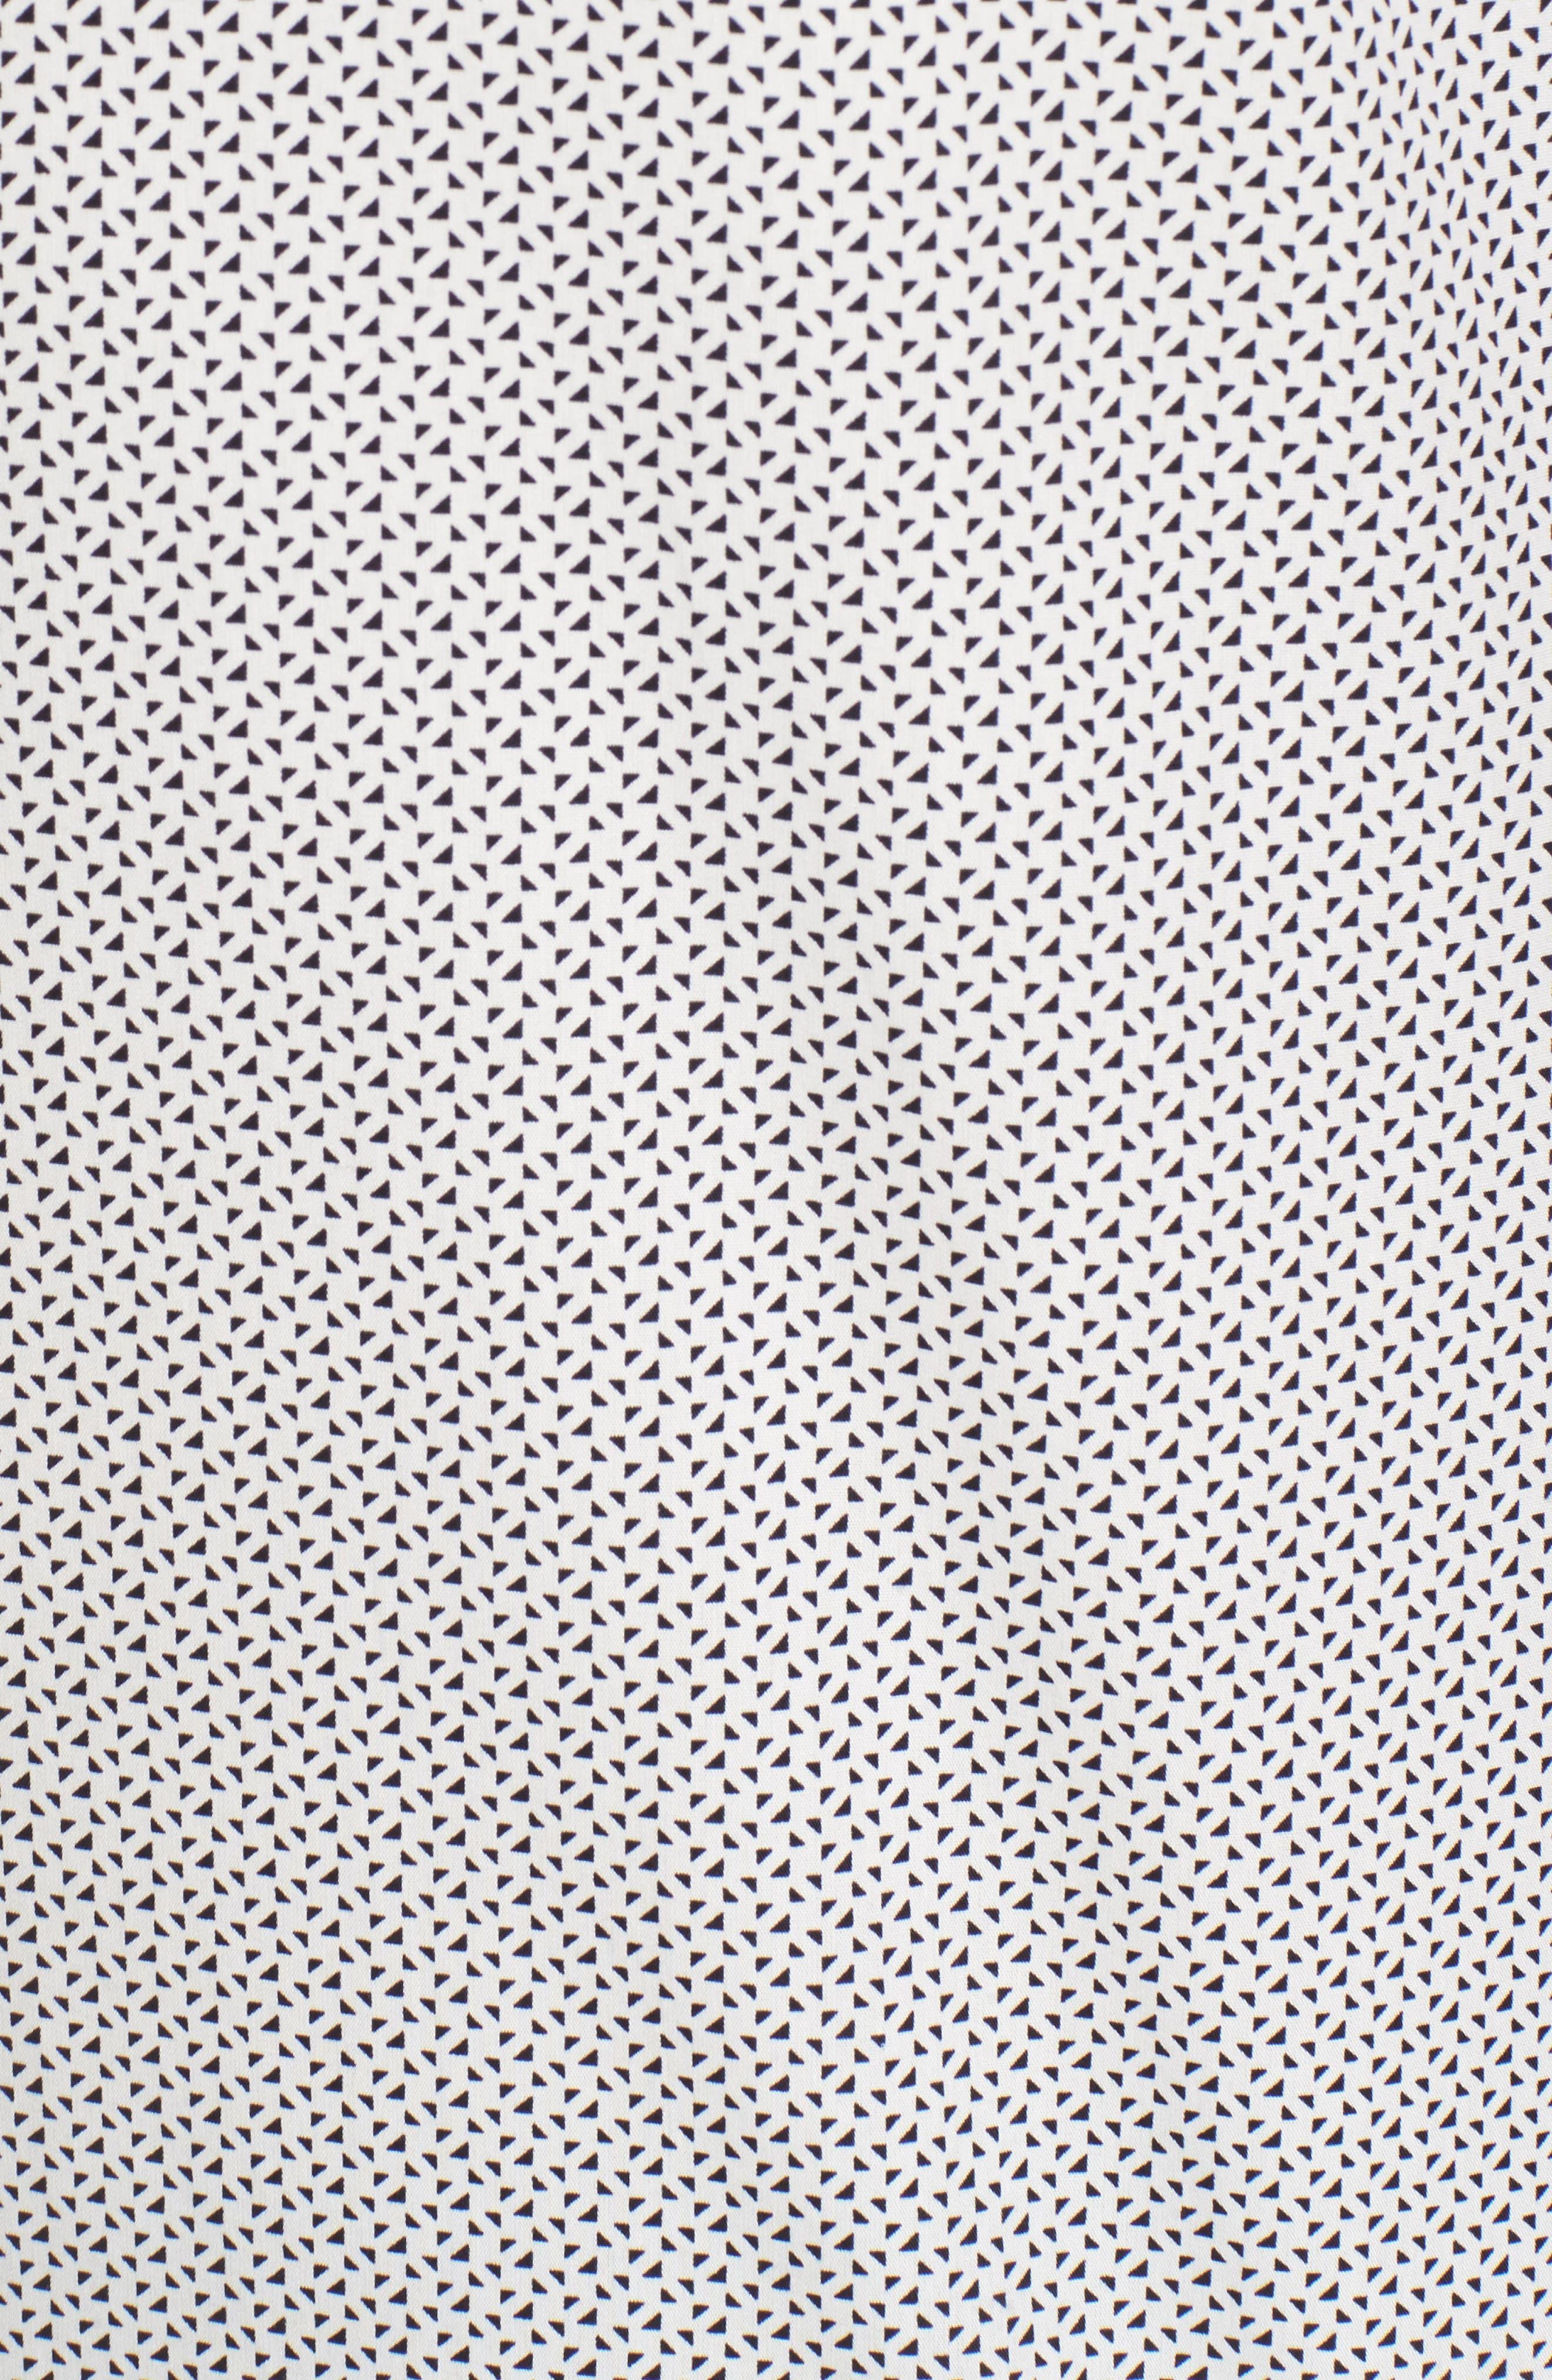 Slim Fit Print Short Sleeve Sport Shirt,                             Alternate thumbnail 5, color,                             White Navy Triangle